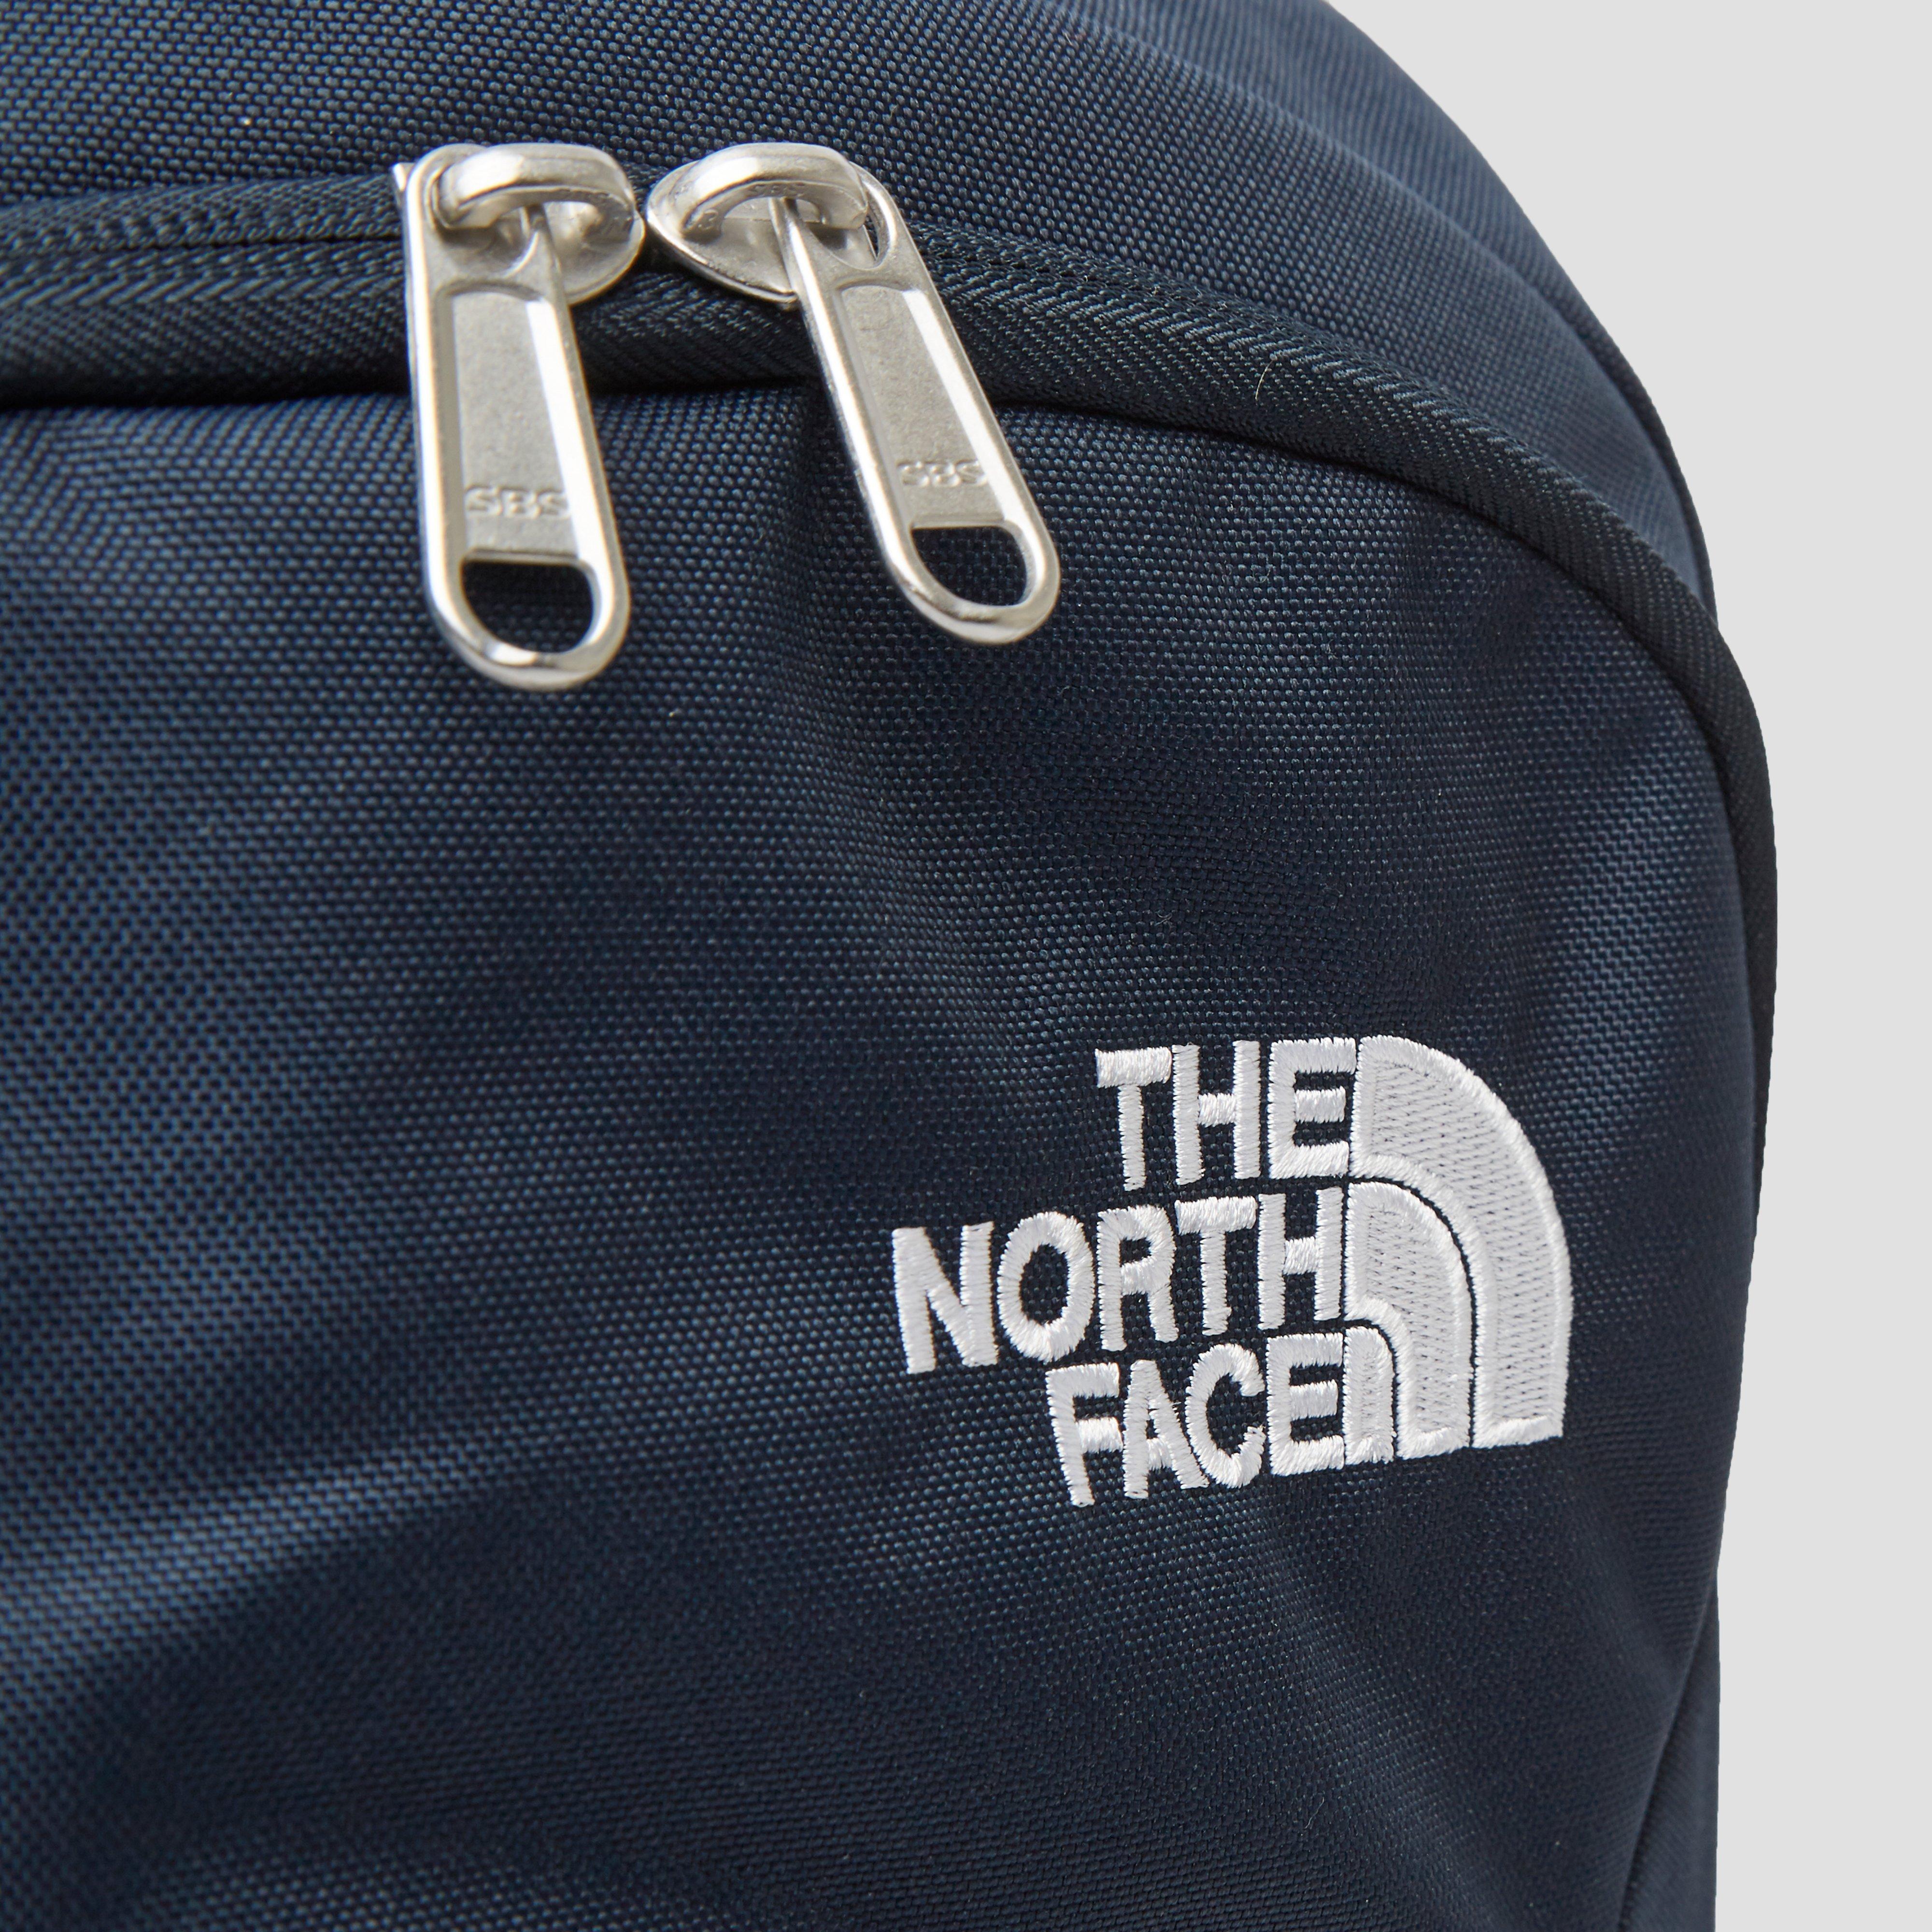 THE NORTH FACE RODEY DAYPACK 27 LITER BLAUW